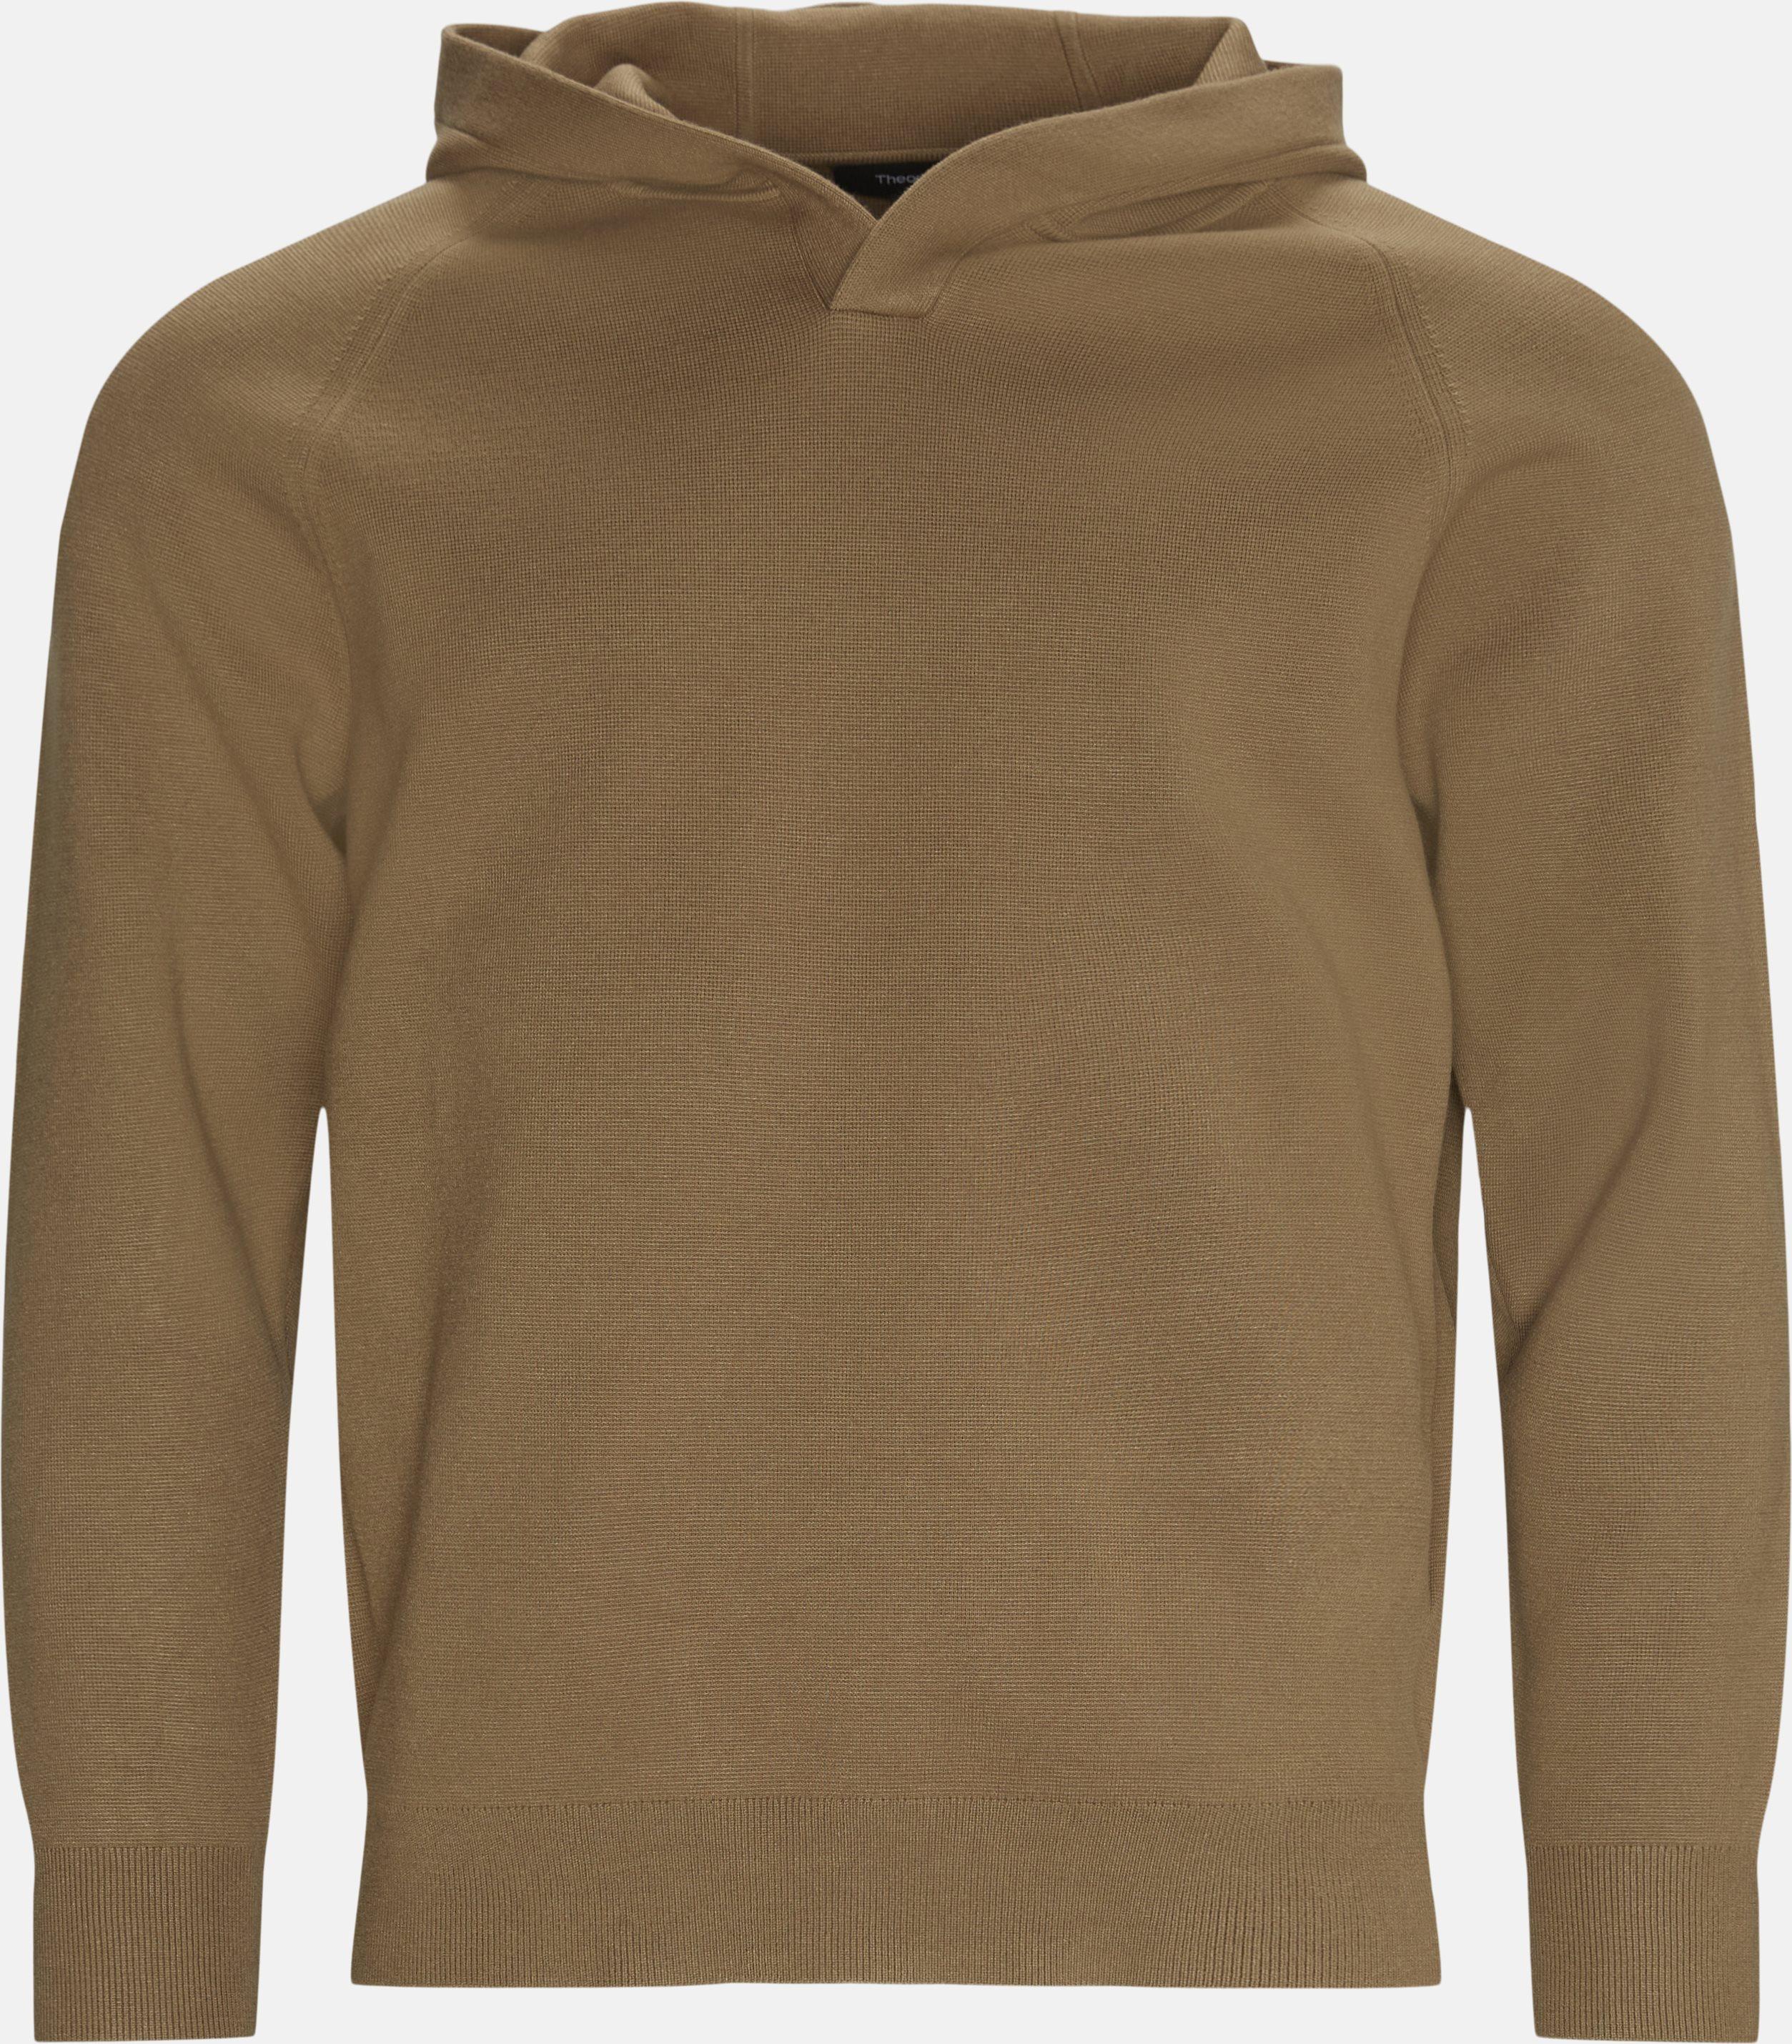 Knitwear - Regular - Brown